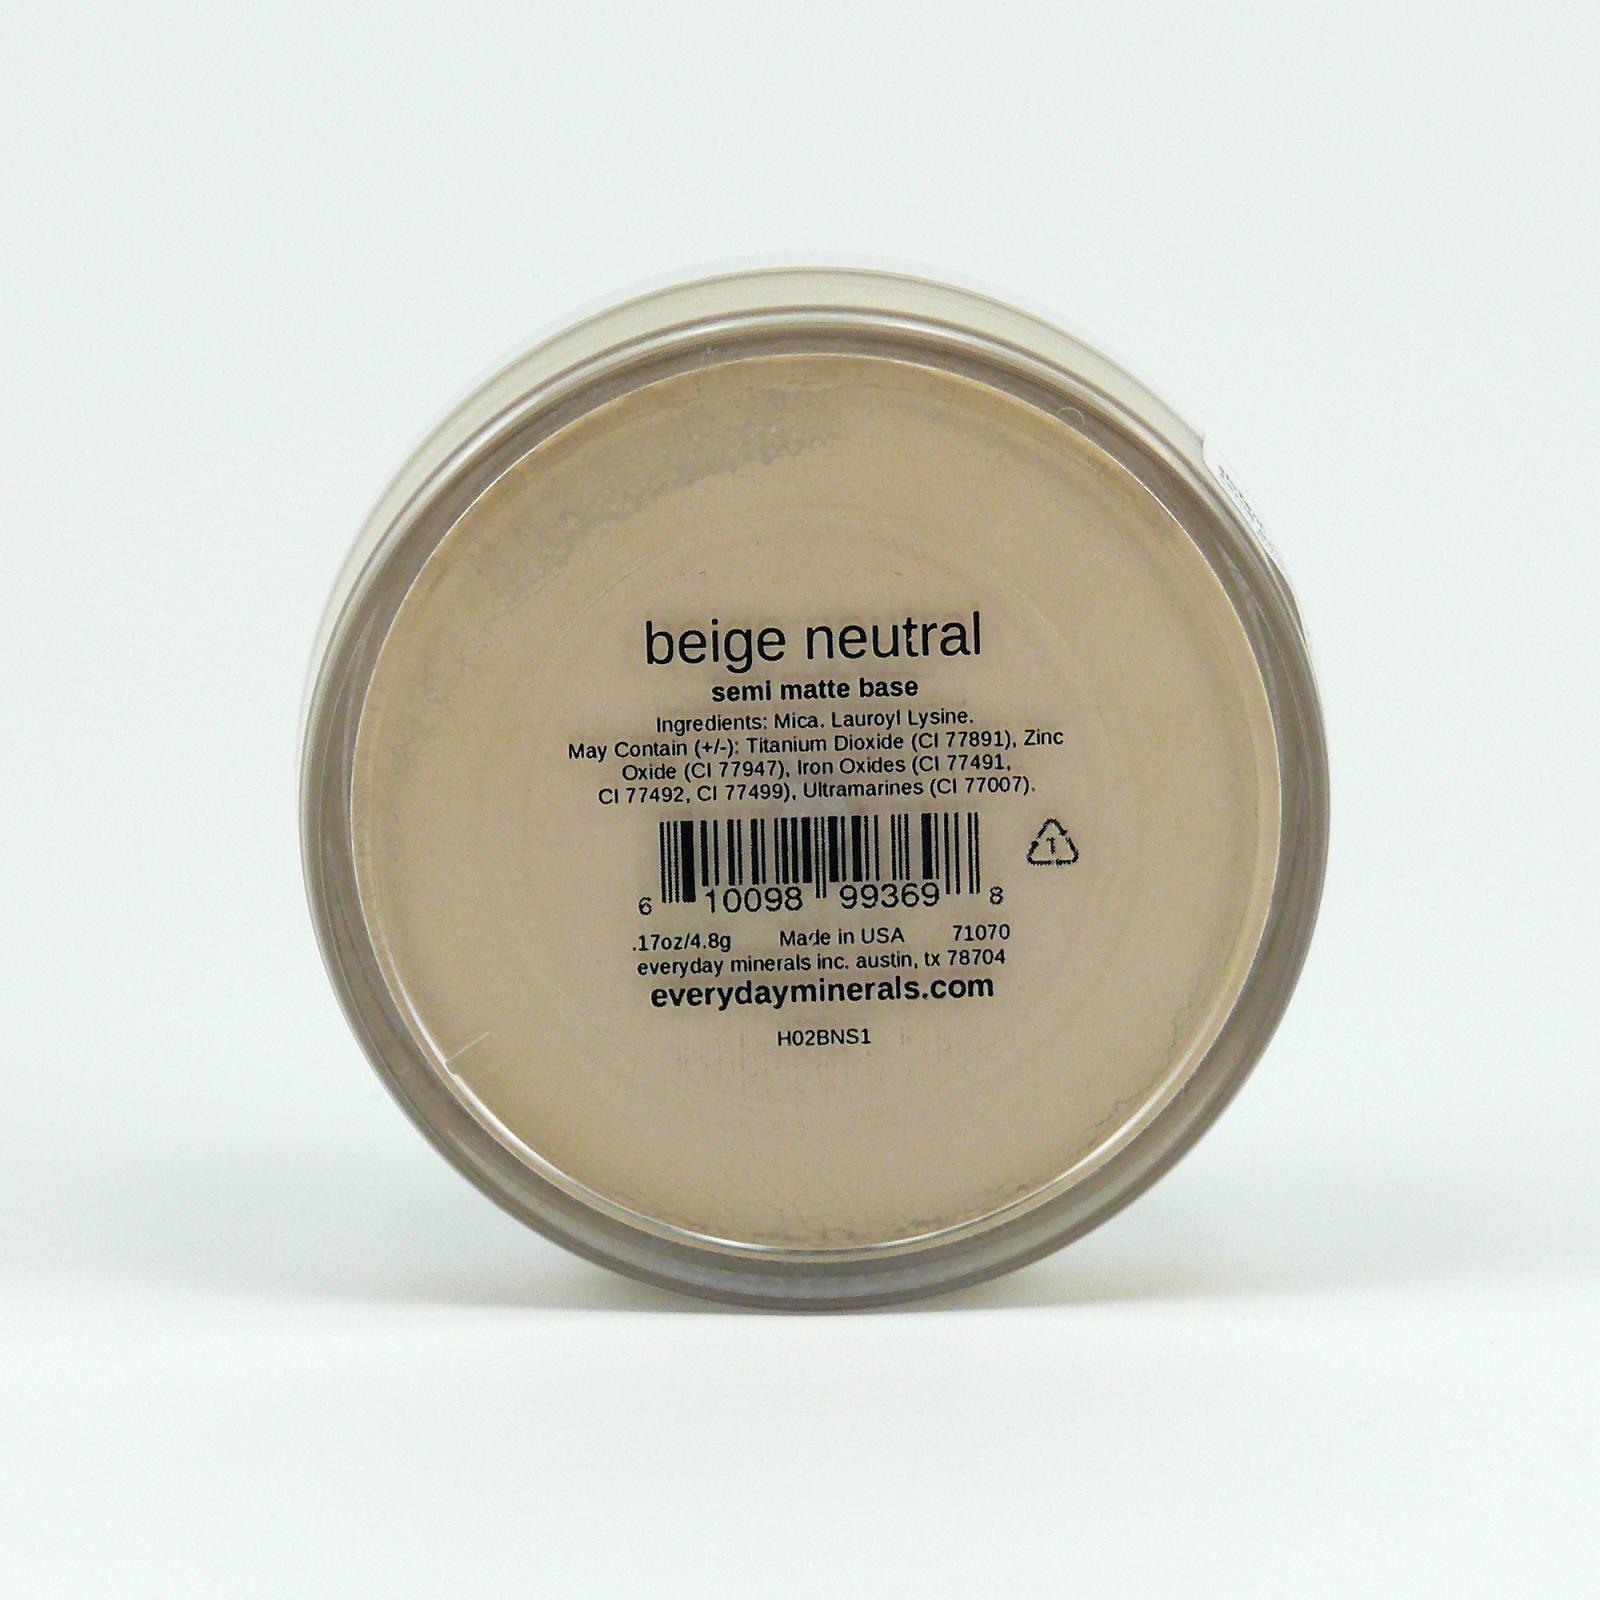 Everyday Minerals Minerální make-up Beige Neutral, Semi-matte 4,8 g